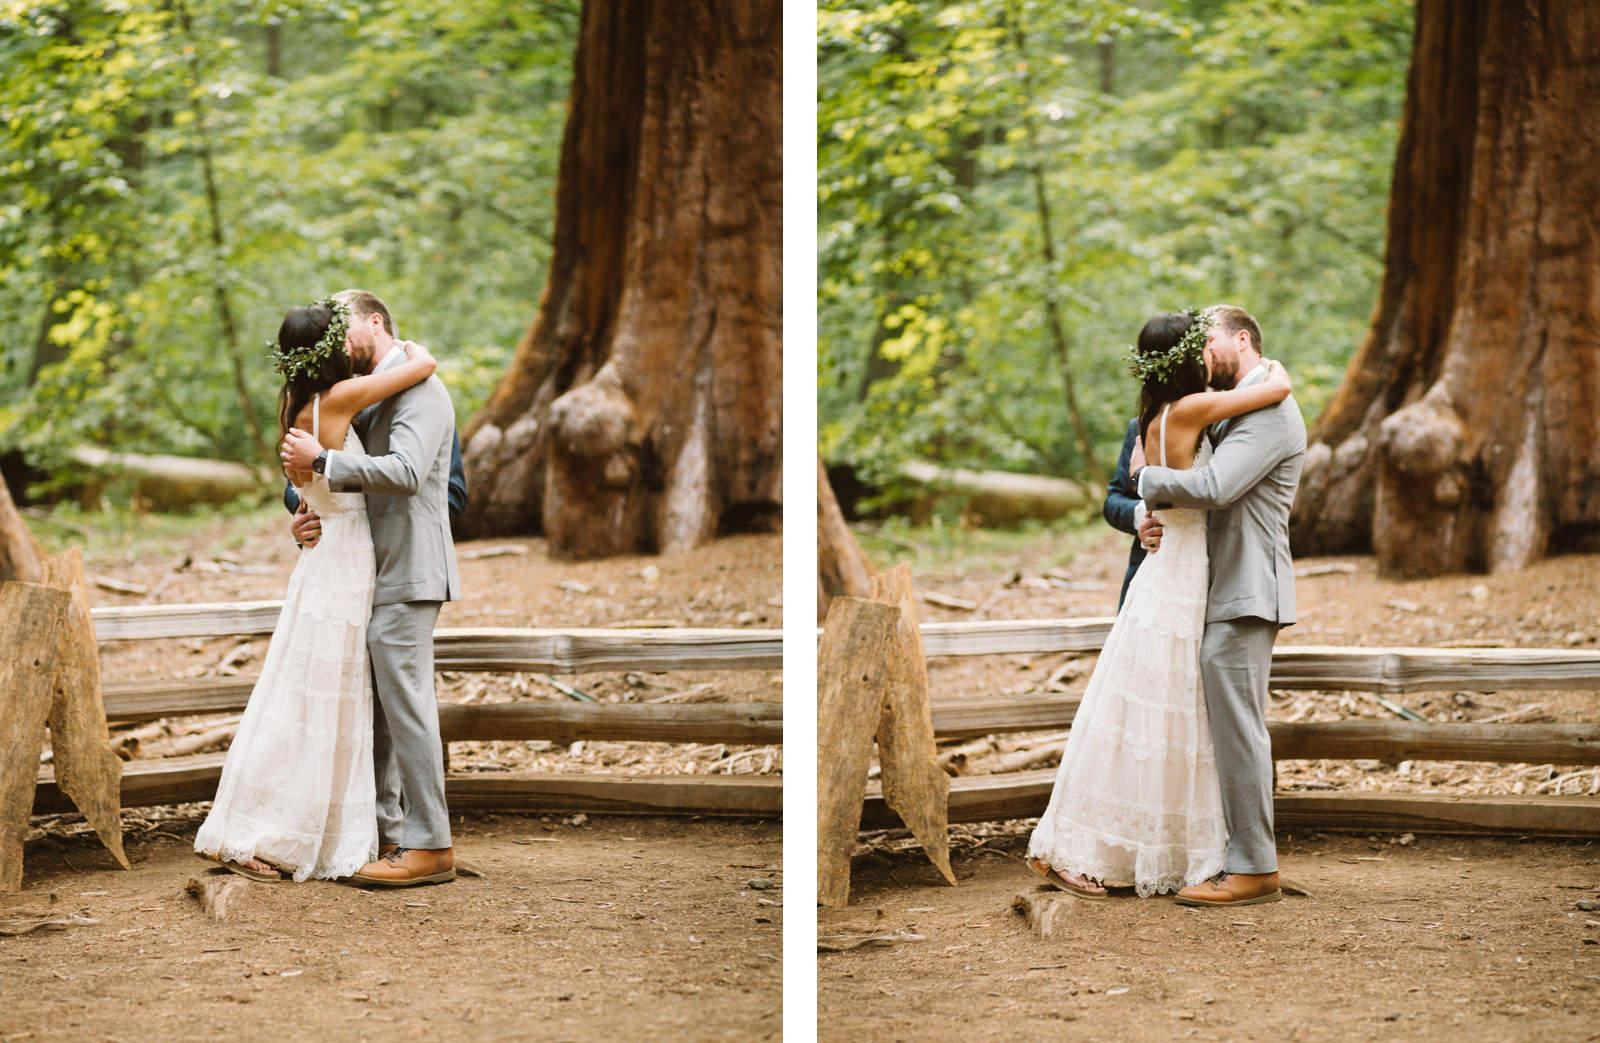 yosemite-intimate-wedding-062 YOSEMITE INTIMATE WEDDING